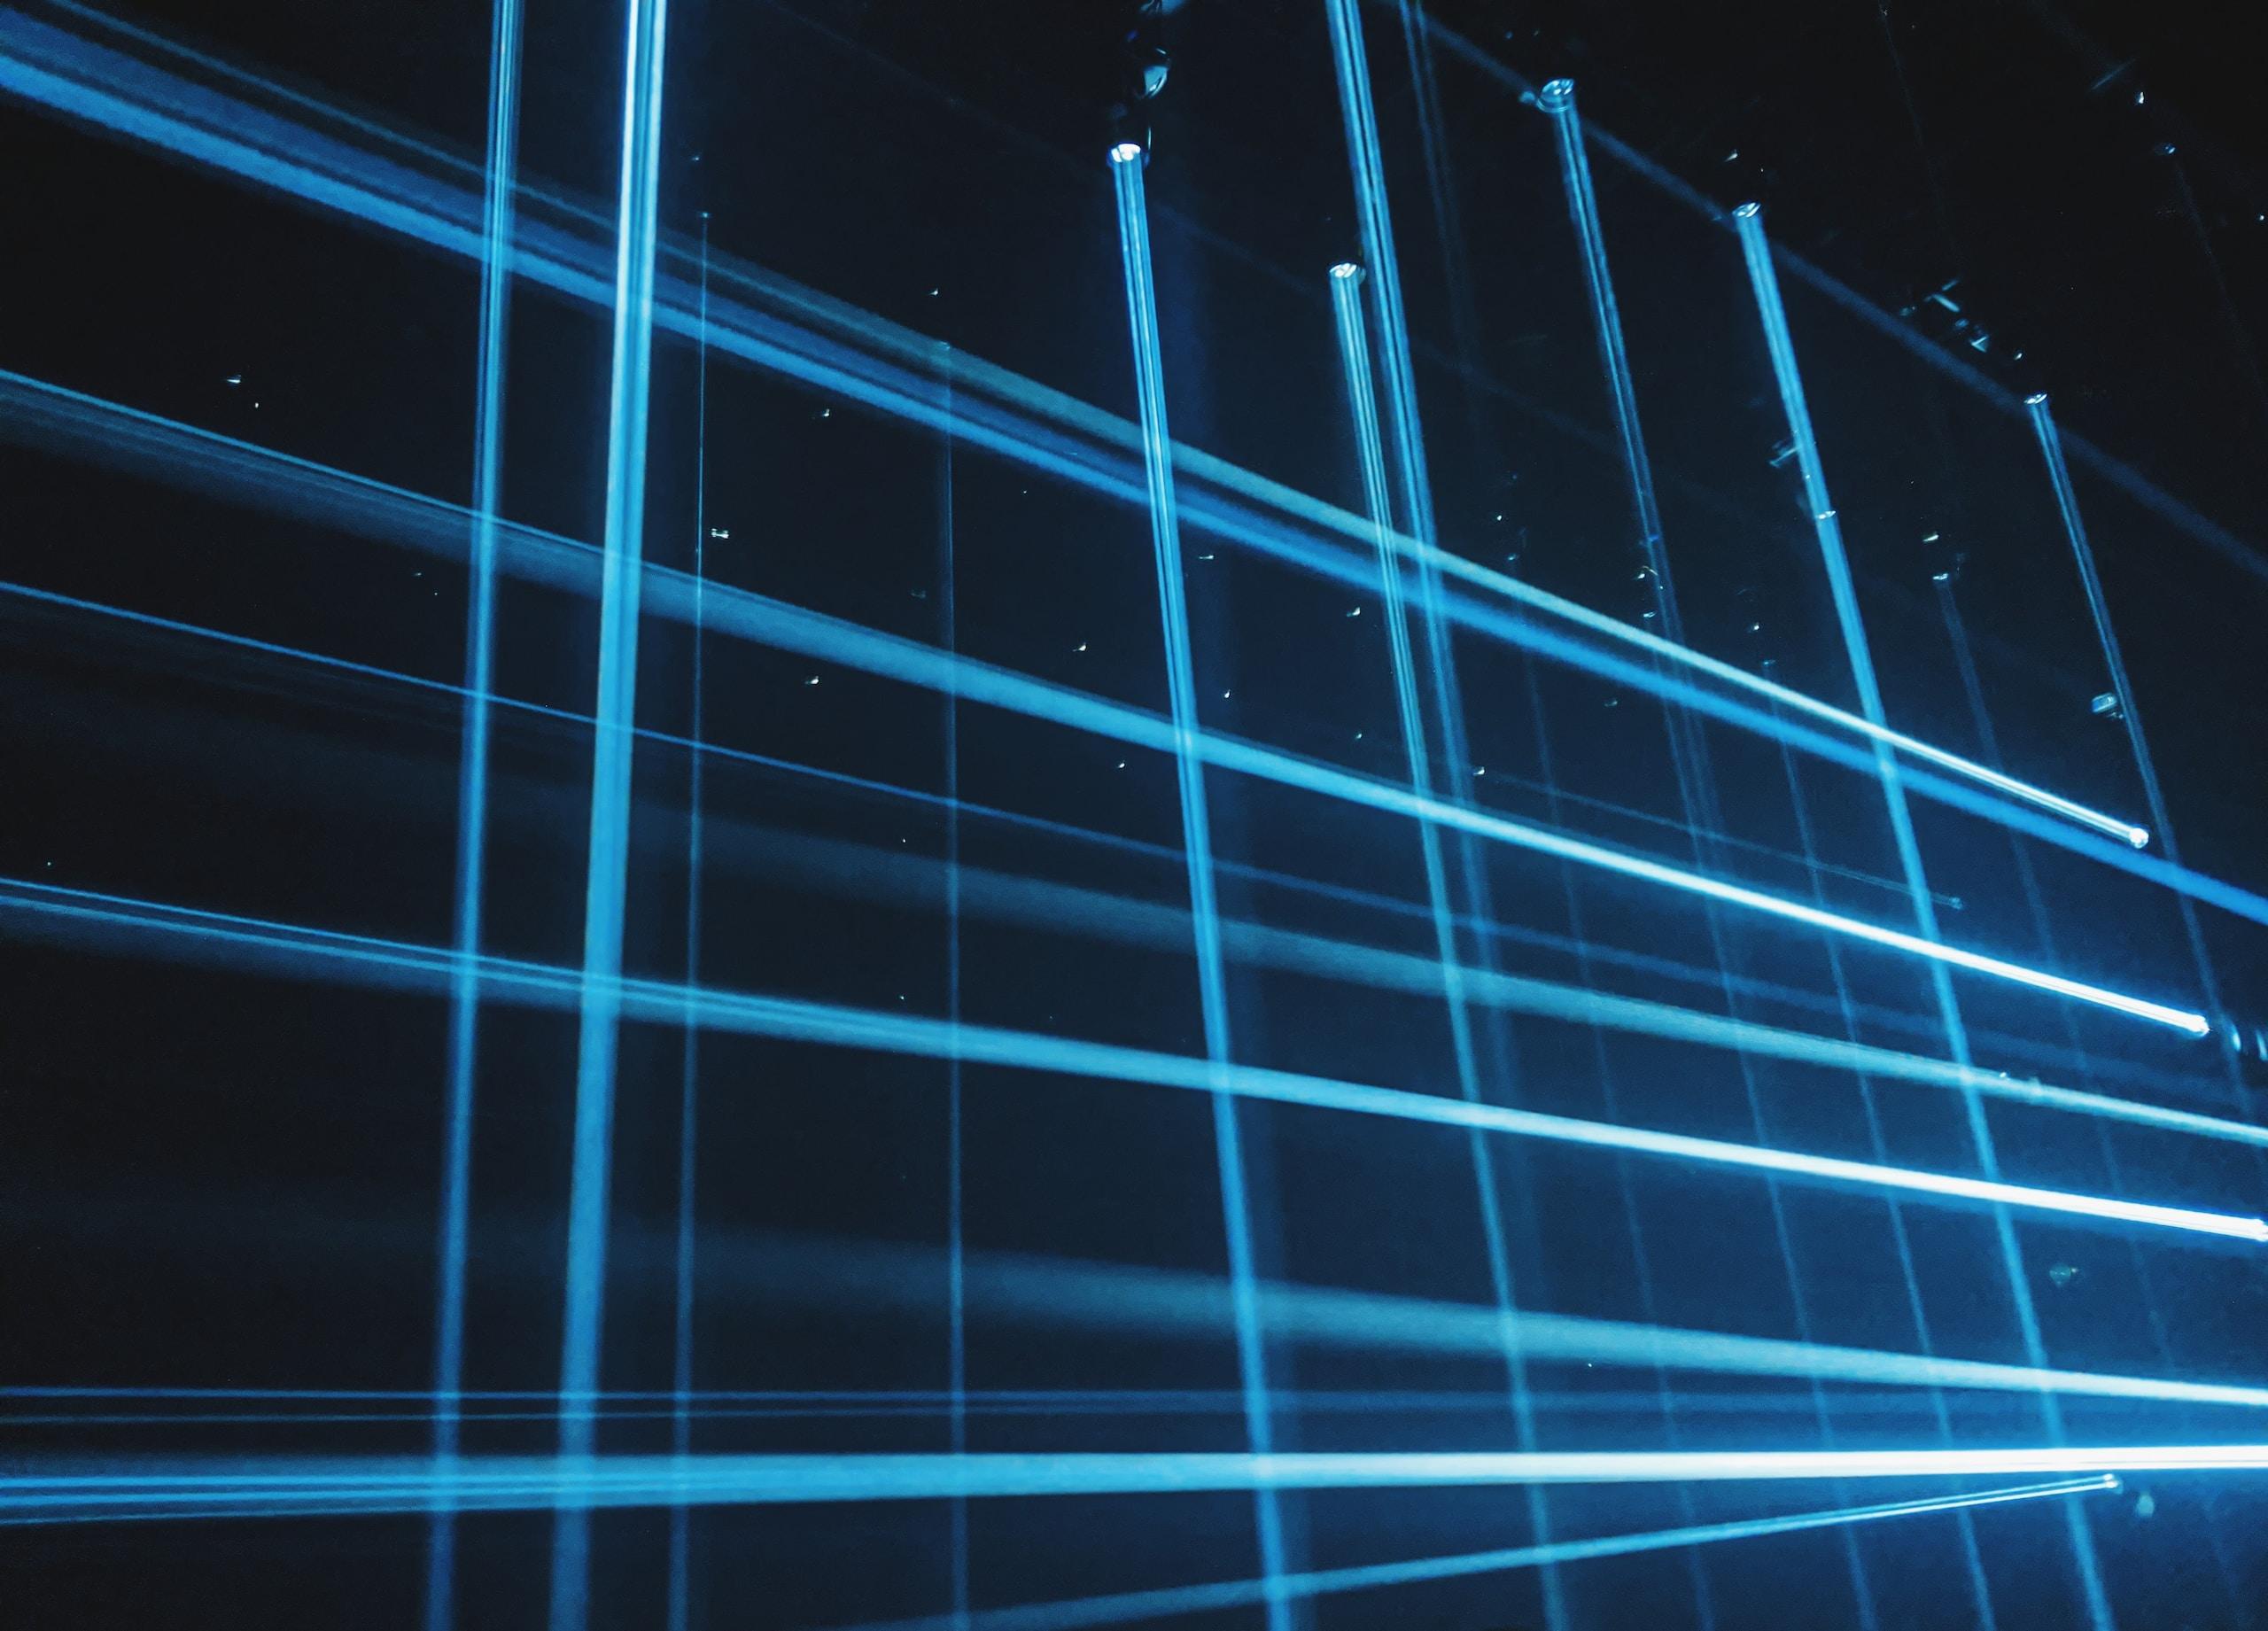 blue and black light digital wallpaper